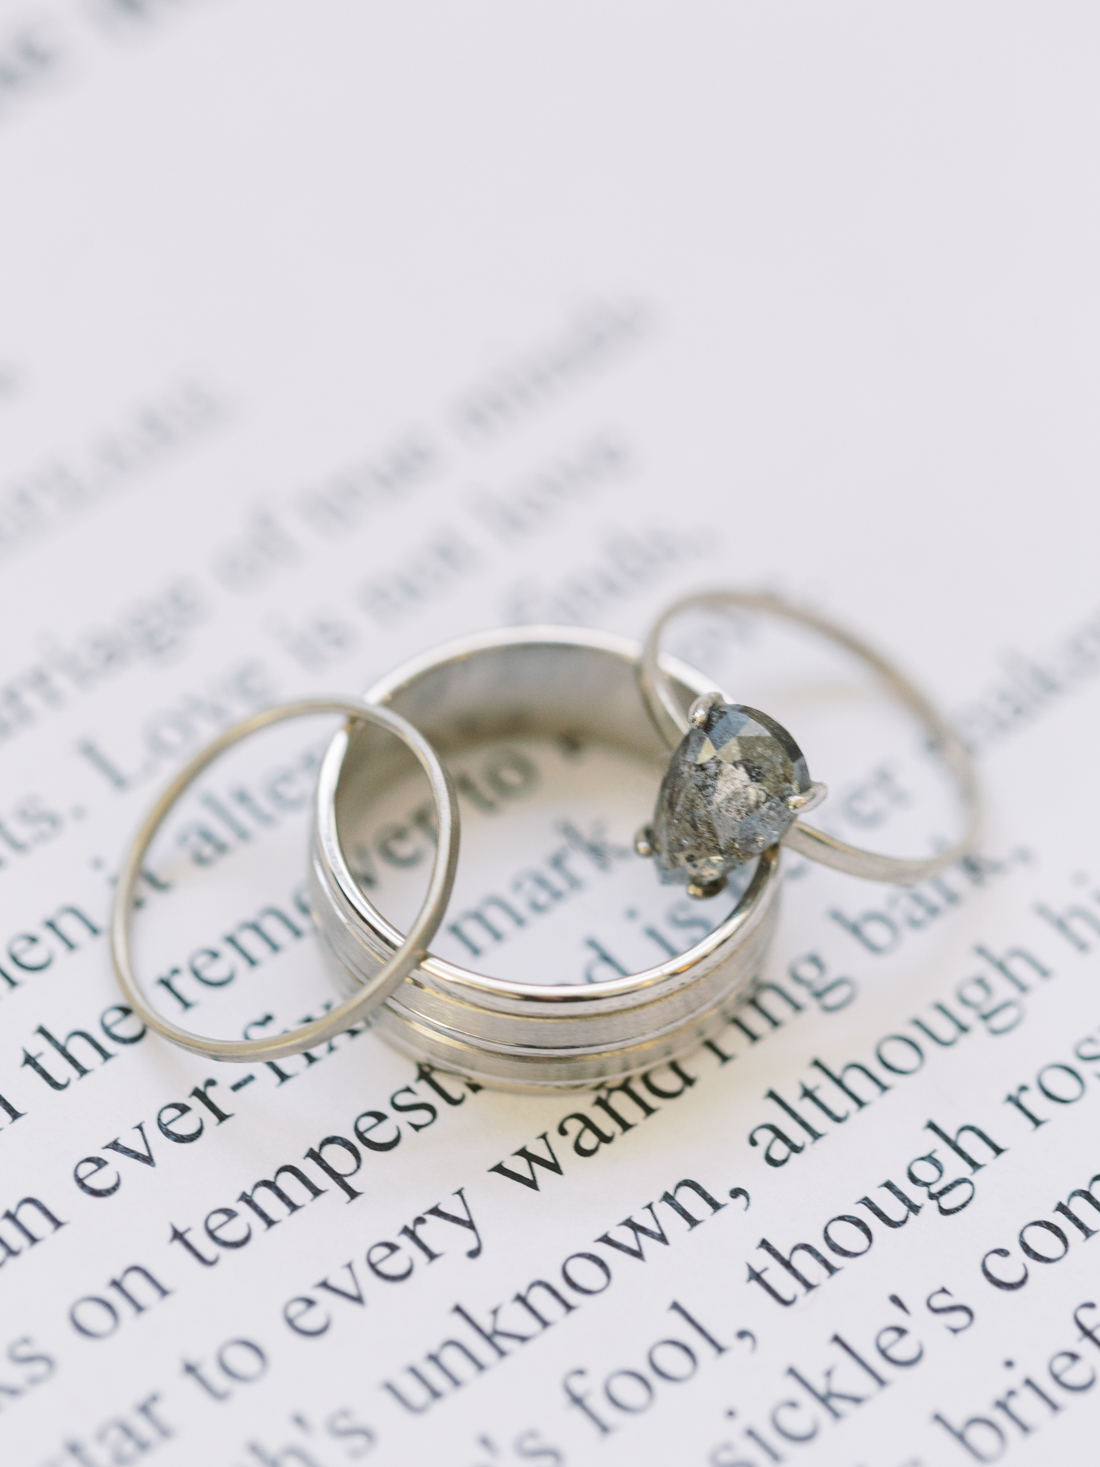 gemstone-engagement-ring-silver